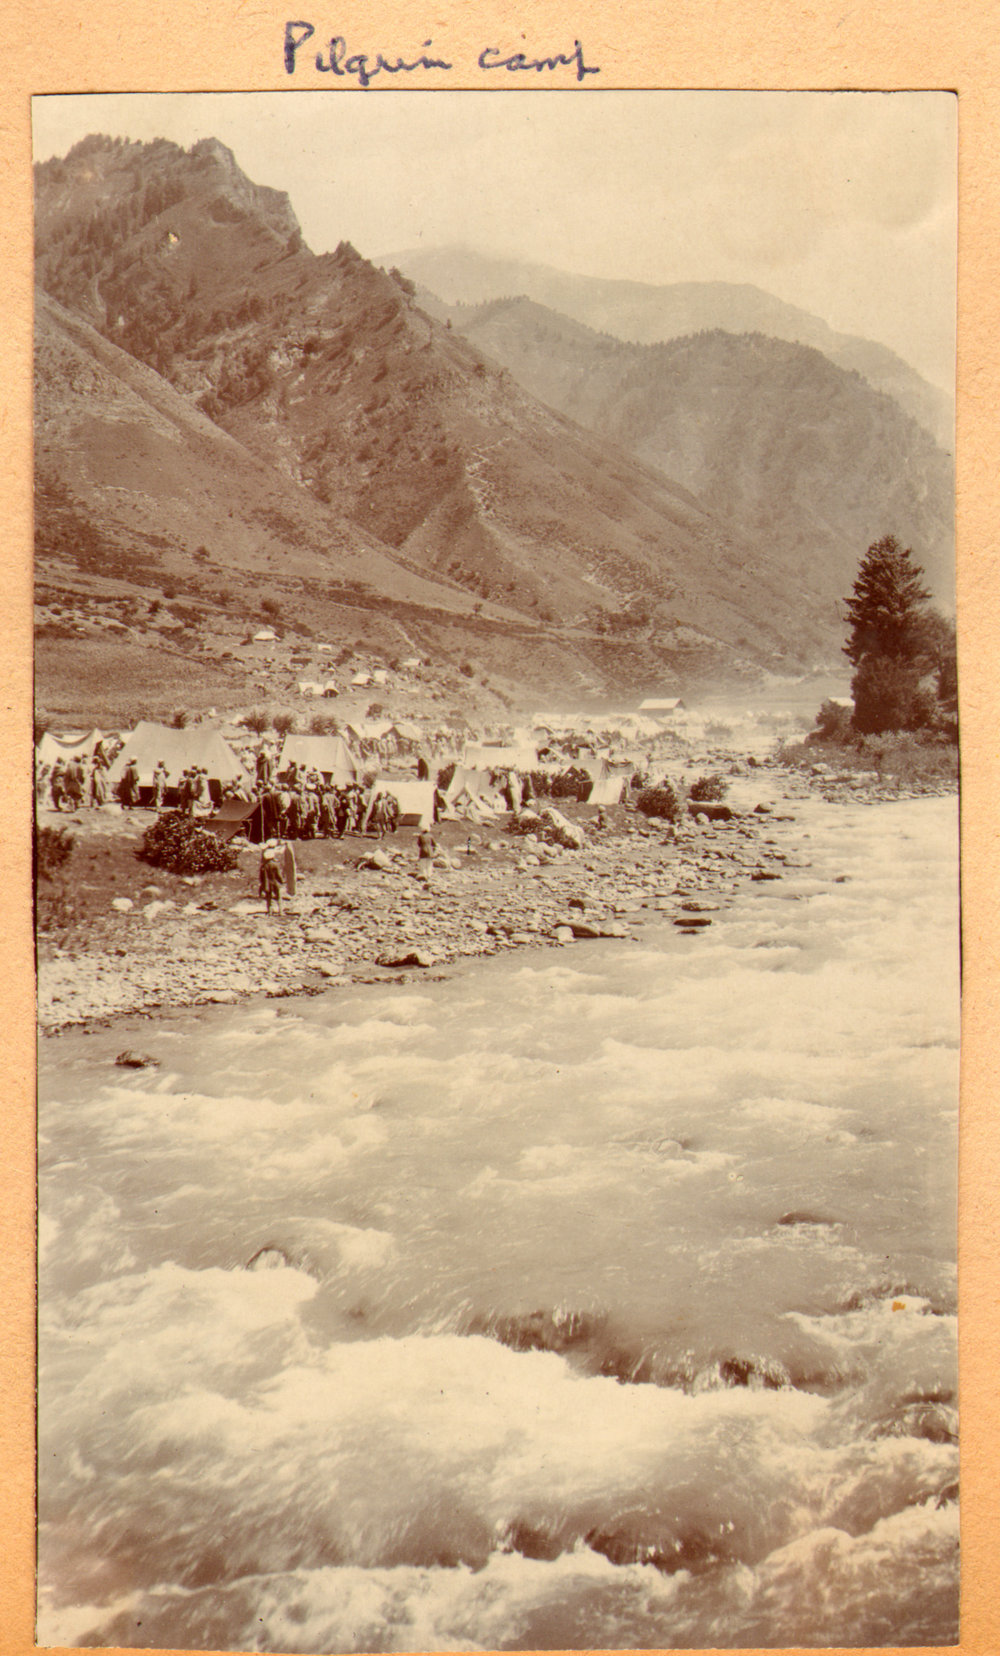 169 1920 Amarnath pilgrim camp, Kashmir by Ralph Stewart.jpg